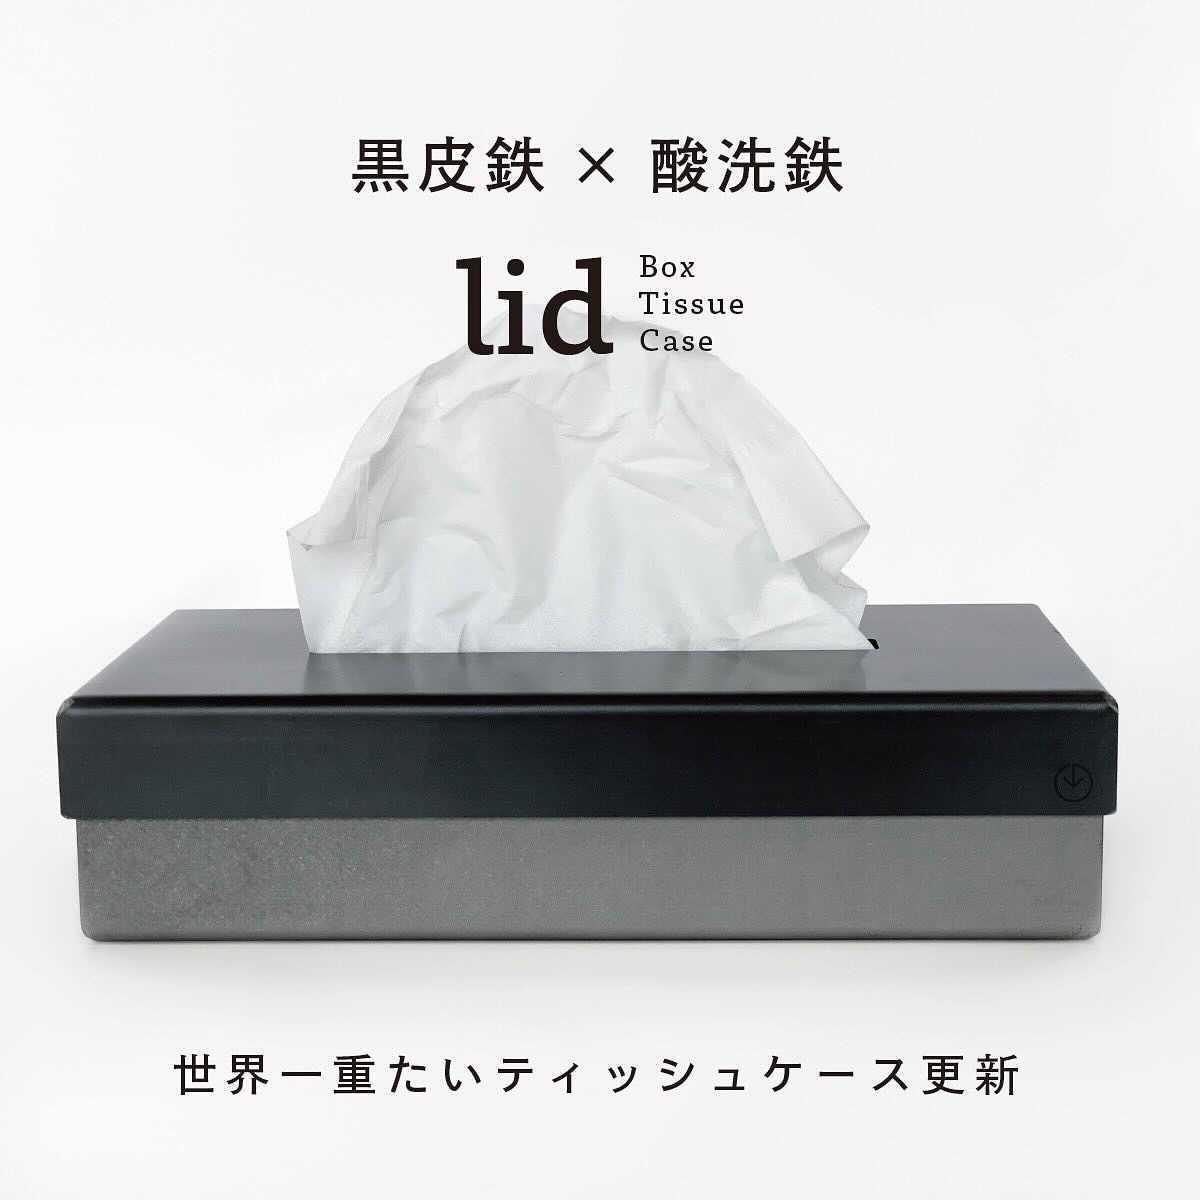 GRAVIRoN lid Box Tissue Case 黒皮鉄×酸洗鉄(ティッシュケース)